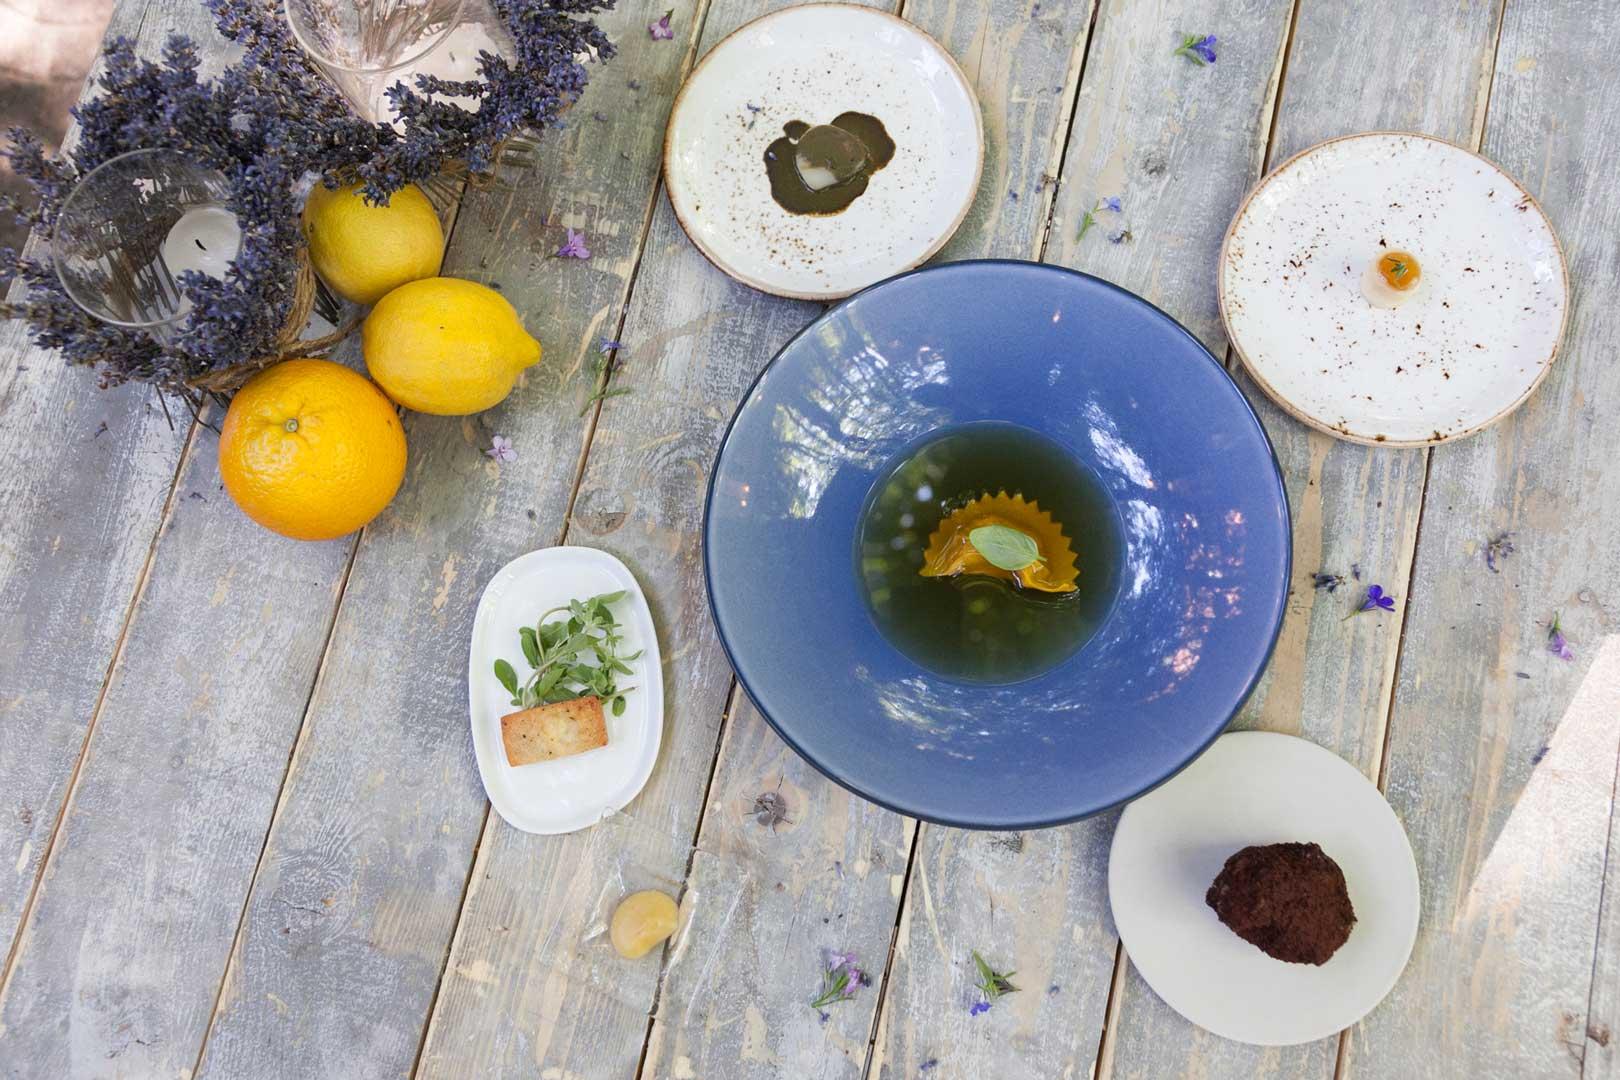 Grey Goose Atelier of Taste @ Sheraton Diana Majestic | Piatti Luigi Taglienti